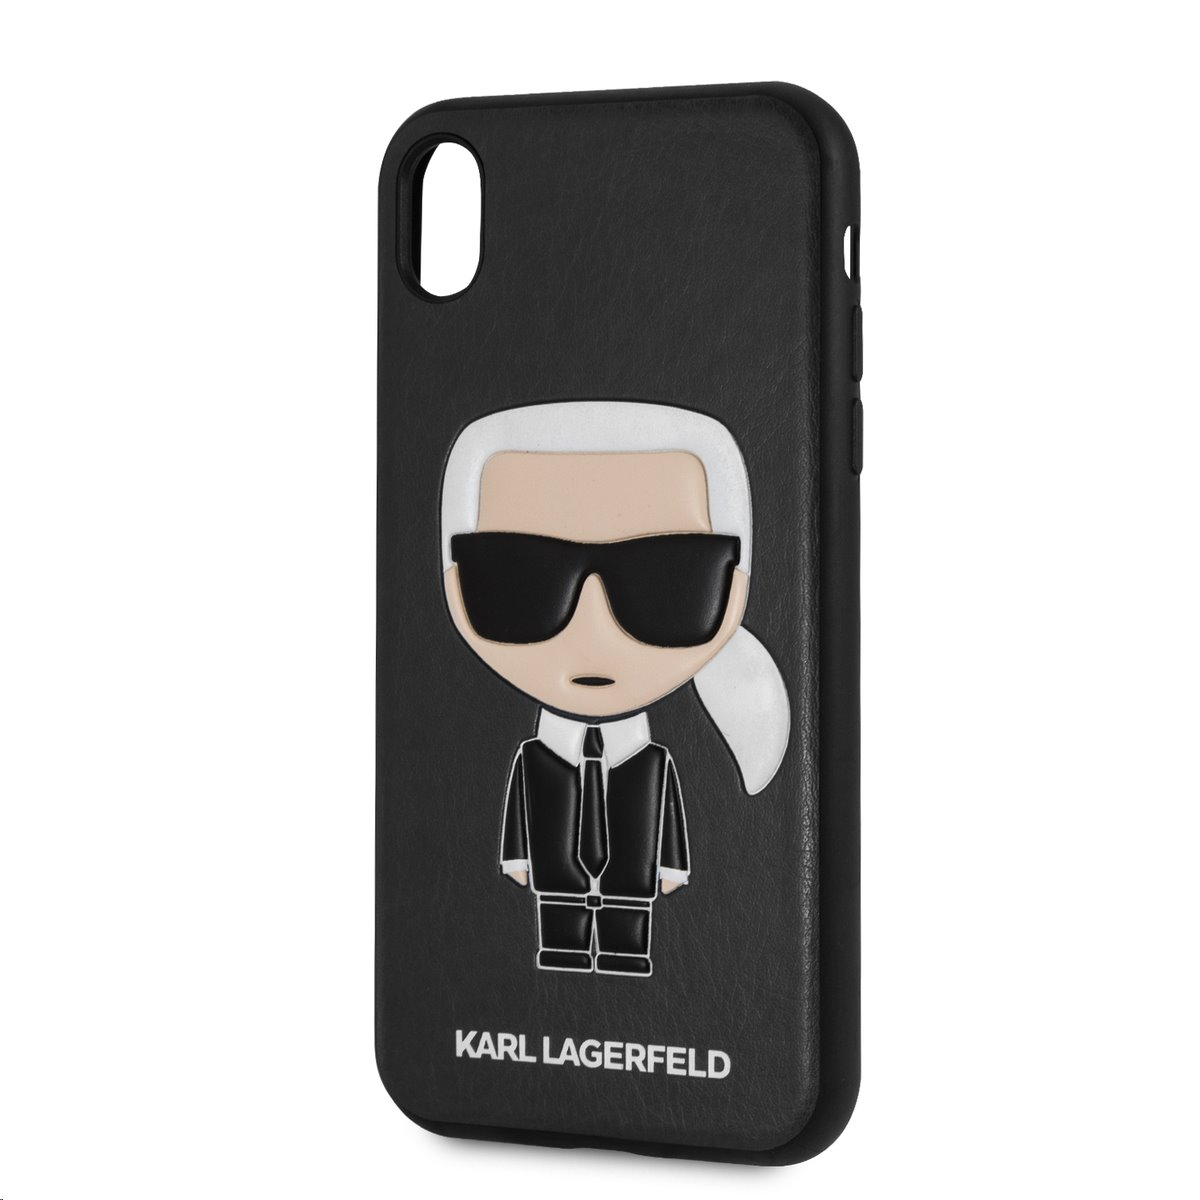 Silikonové pouzdro Karl Lagerfeld Ikonik Case na iPhone XR, black